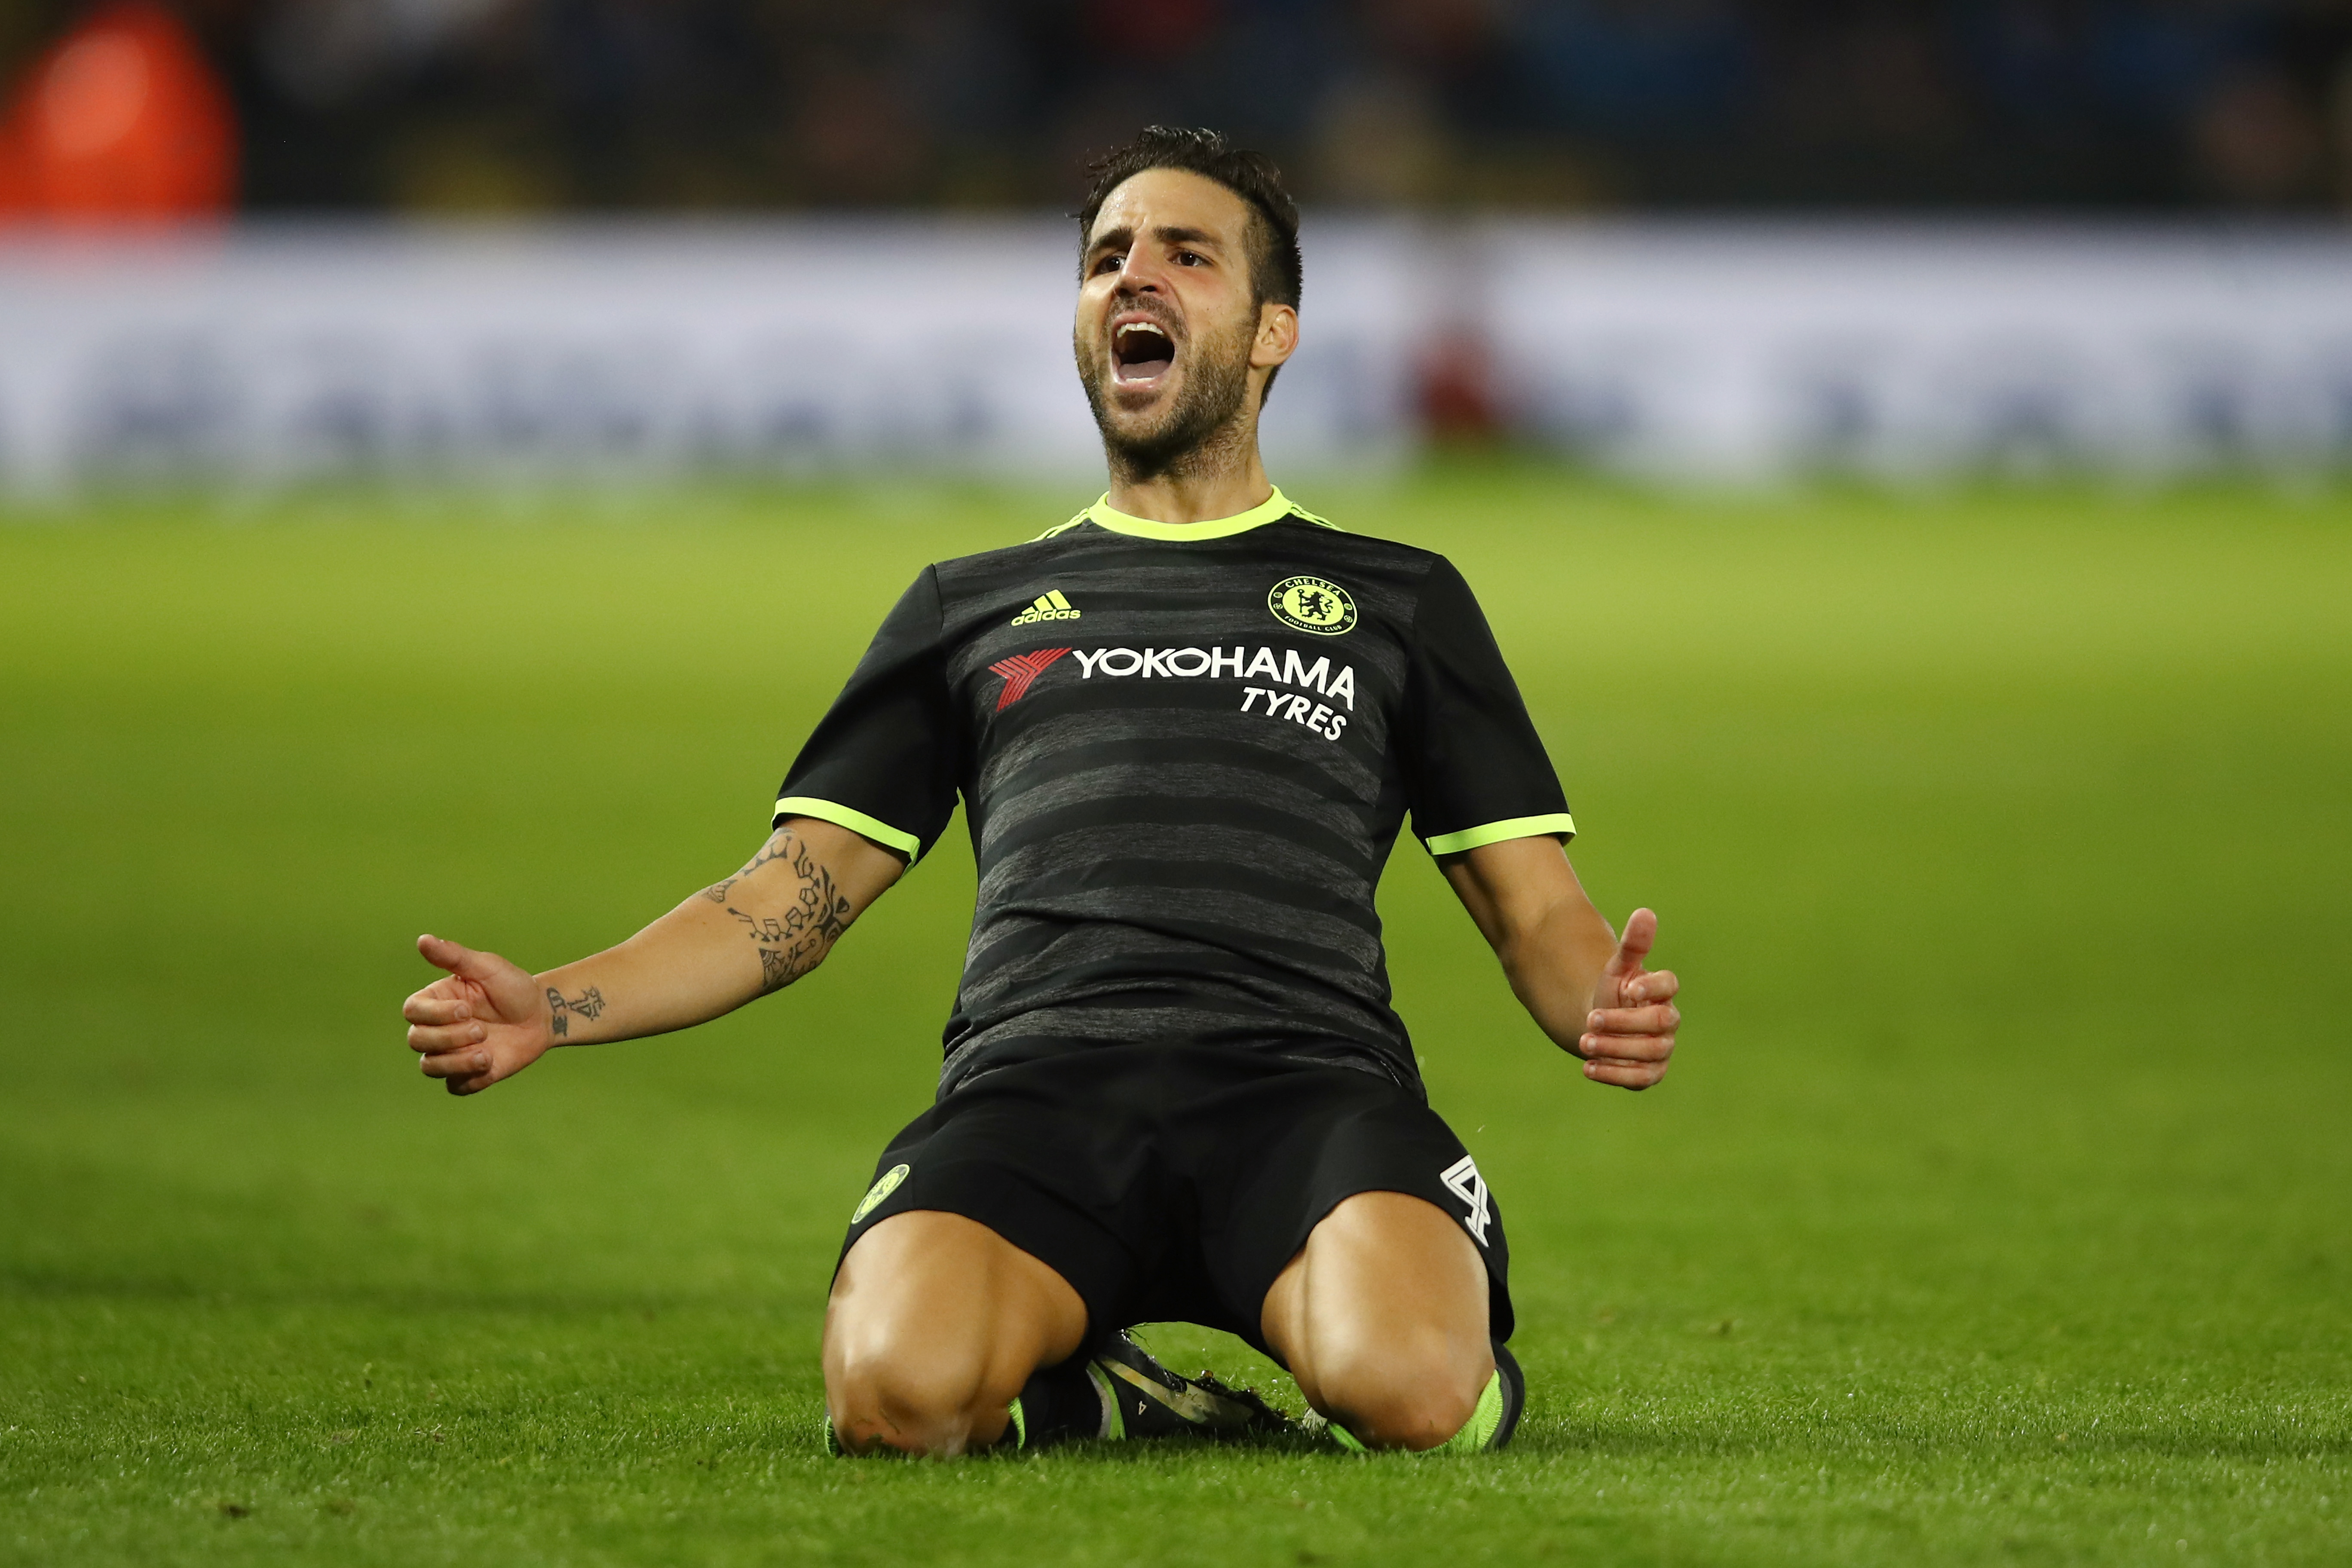 Arsenal hope to see Chelsea start Cesc Fabregas